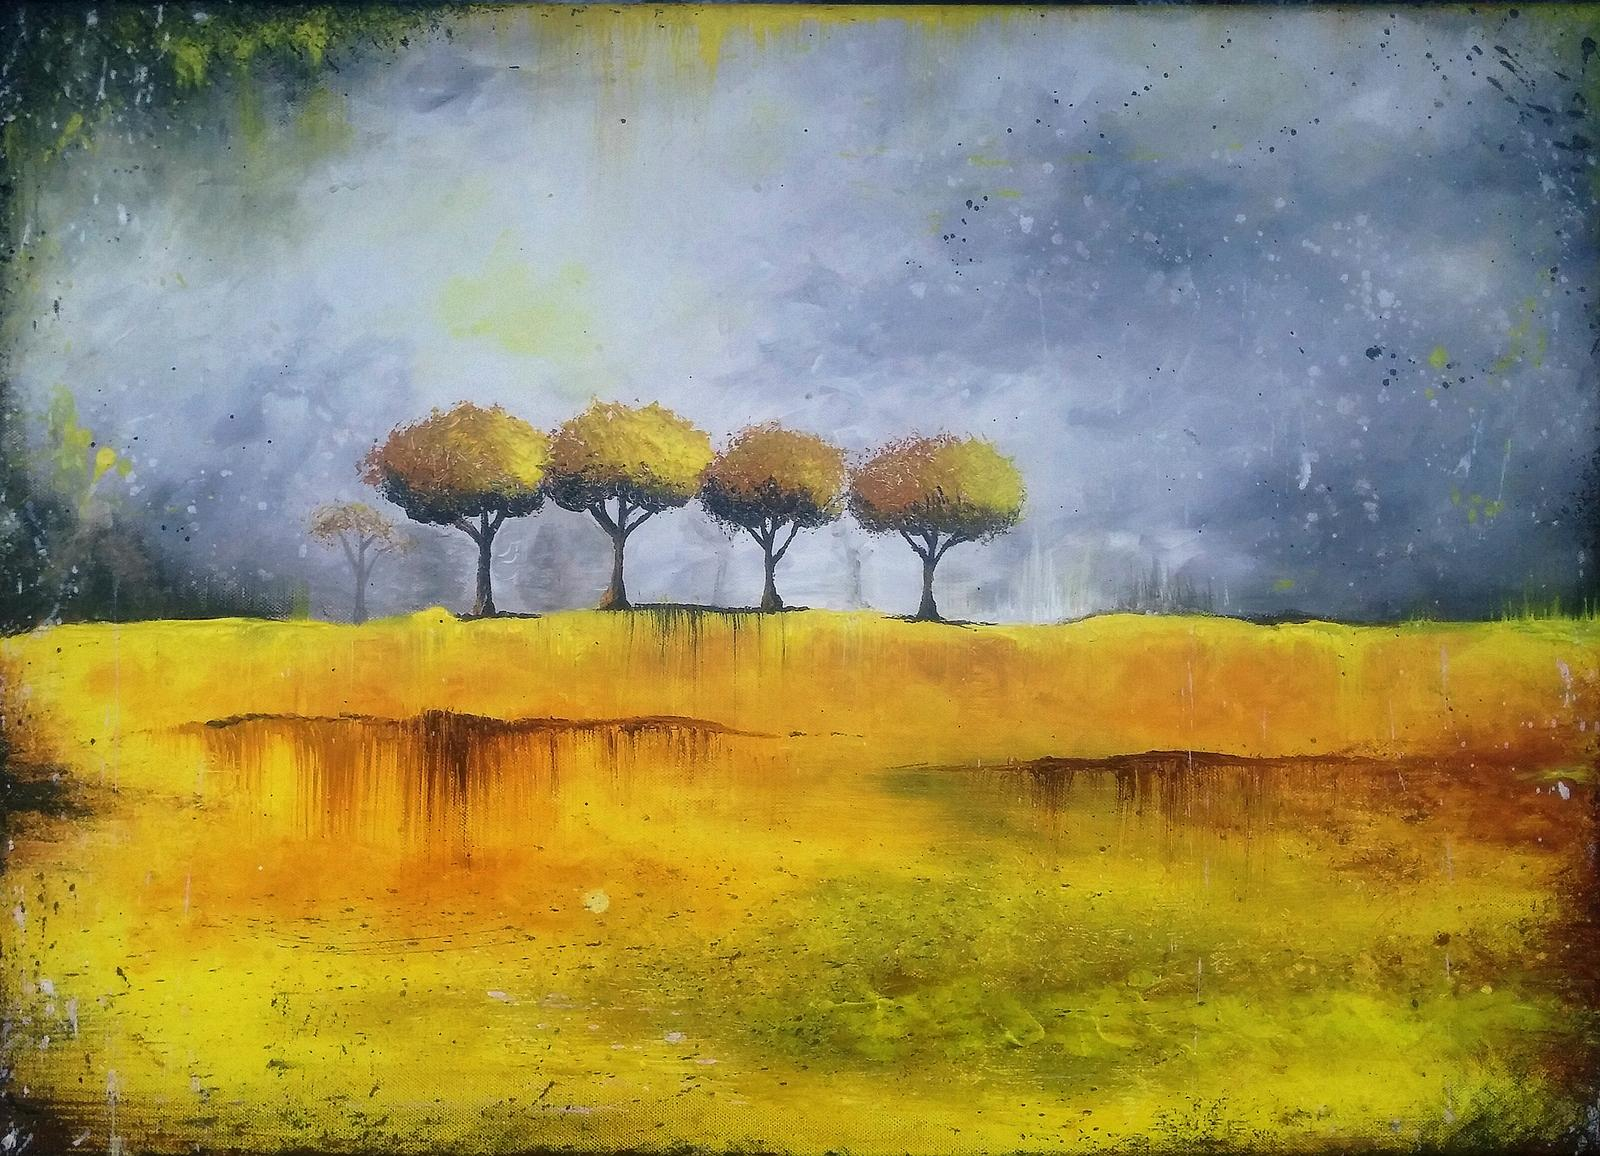 "Dalsi veledilo :-) ... Kdyz Adamek spal, ""Žlutá krajina"" akryl na platne 70 x 50 cm - Obrázek č. 1"